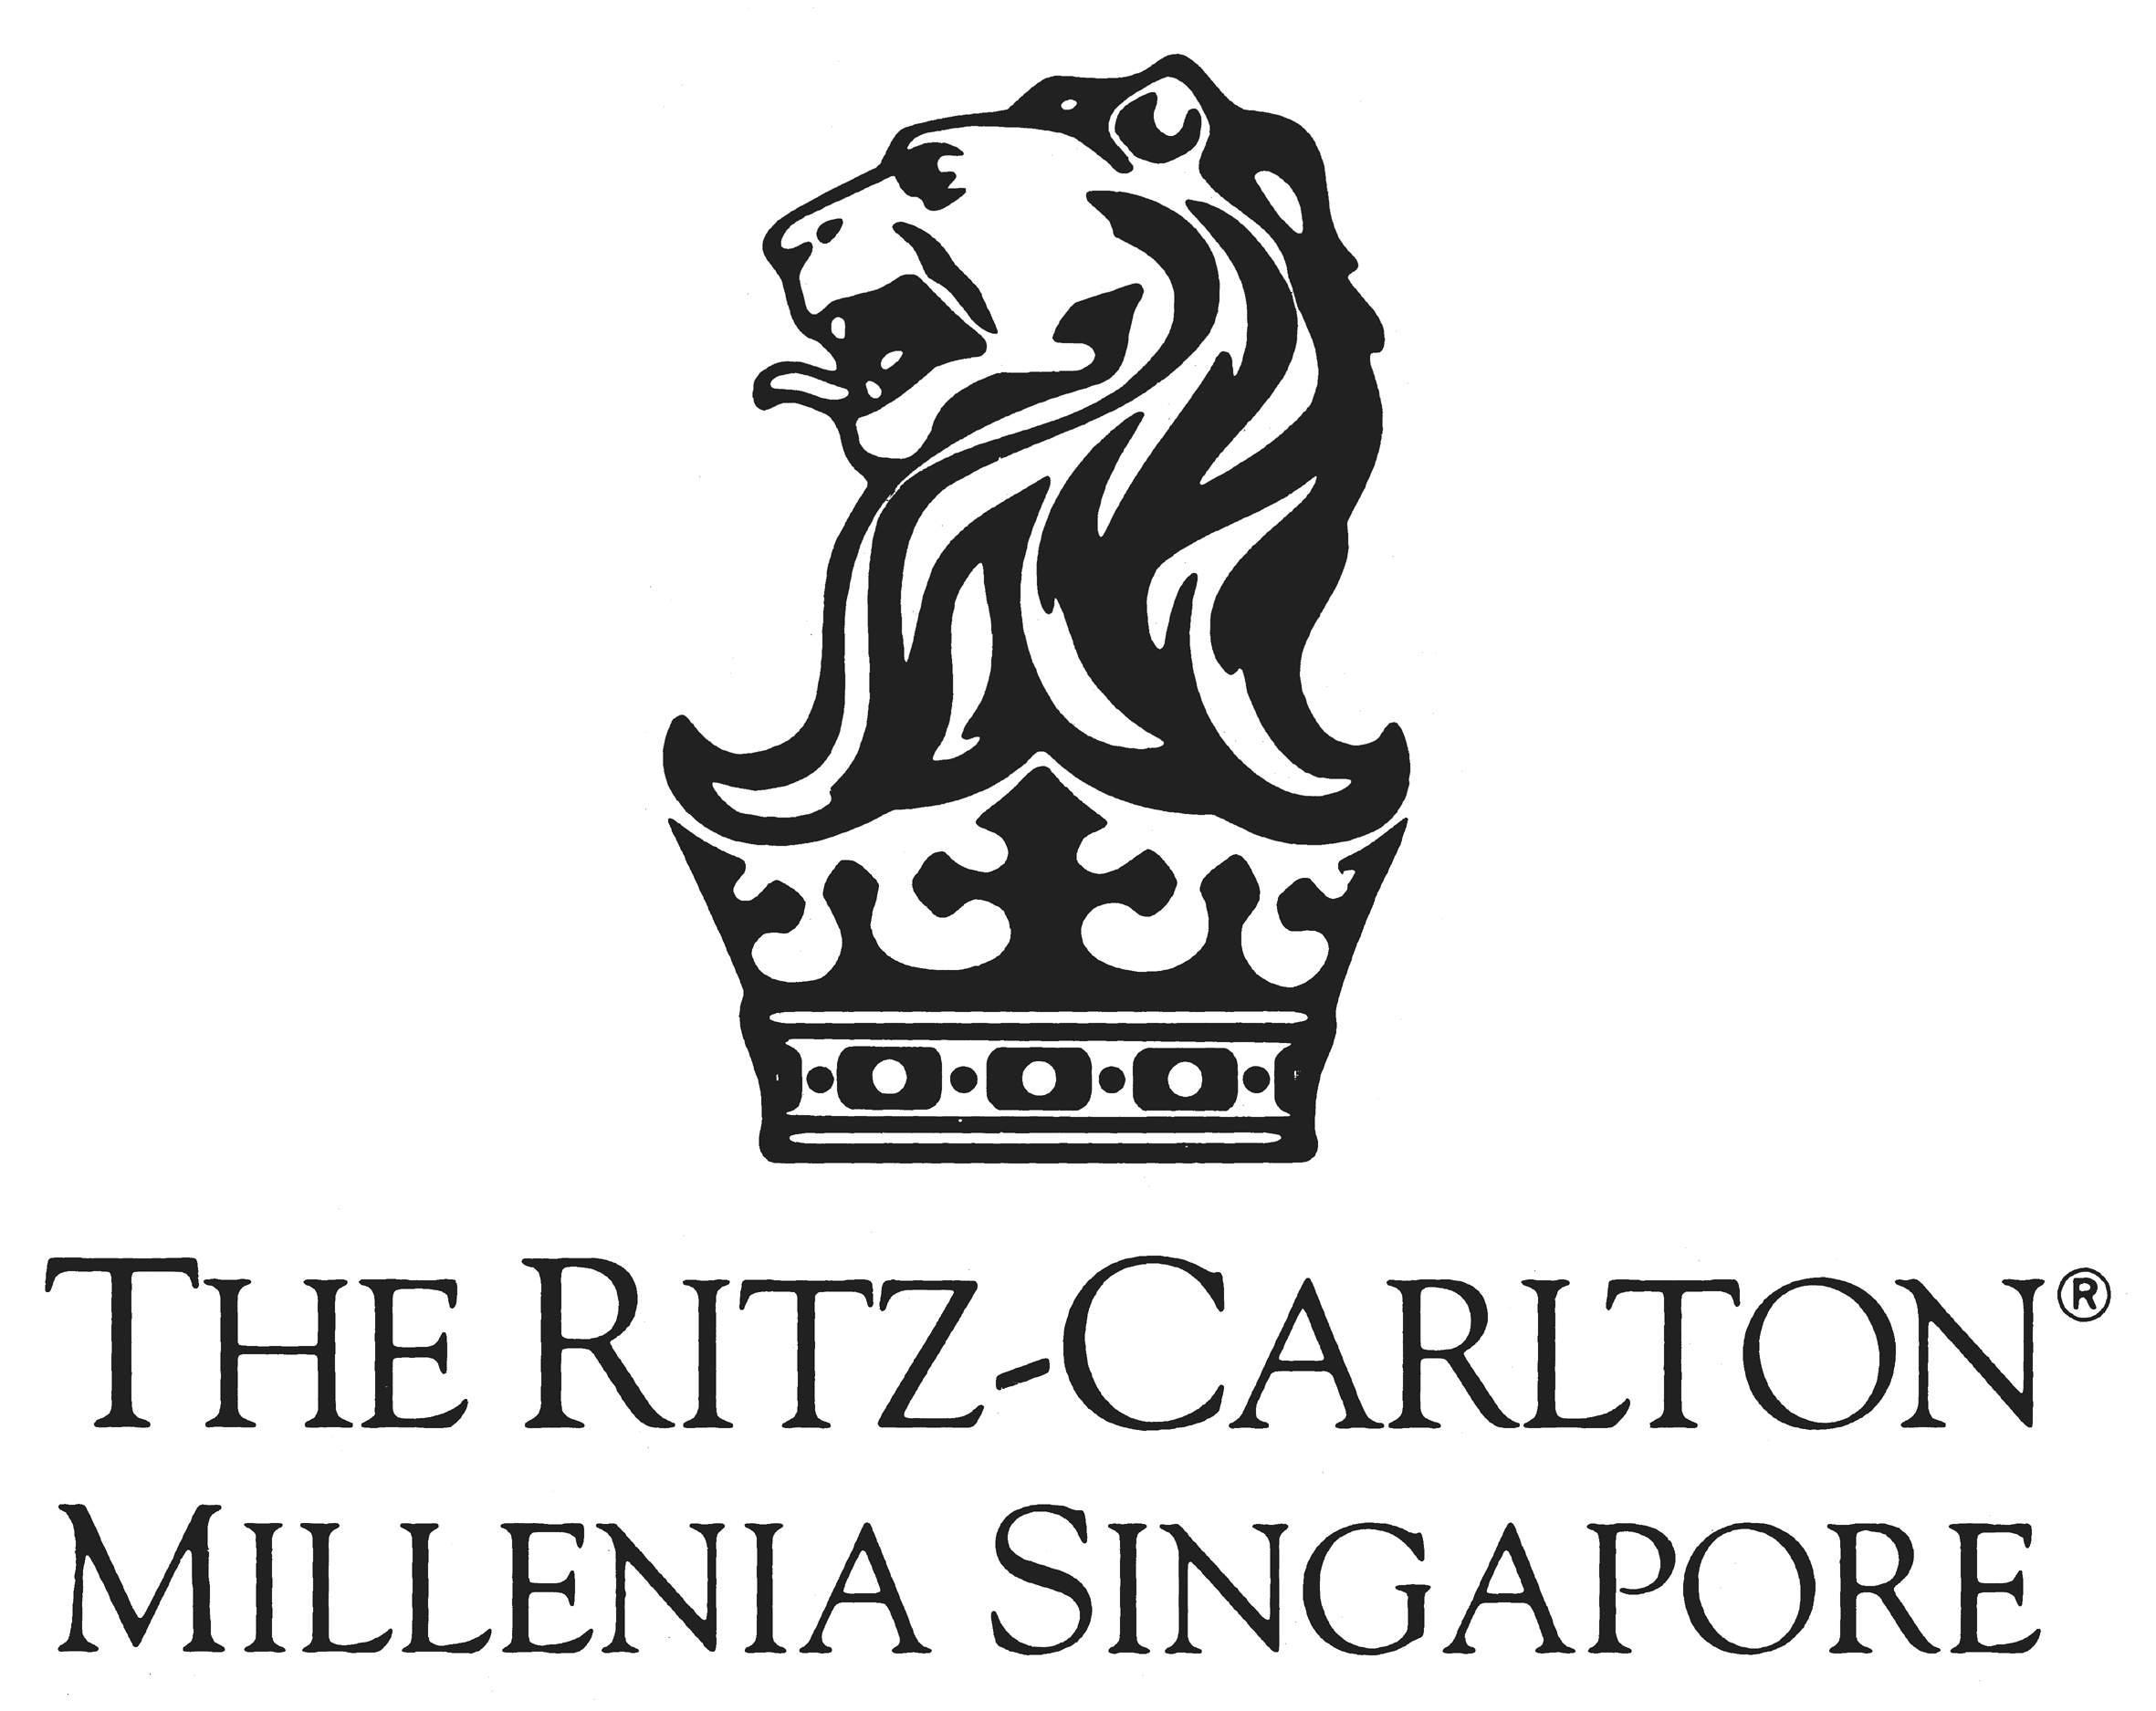 The-Ritz-Carlton-Millenia-Singapore-logo.jpg